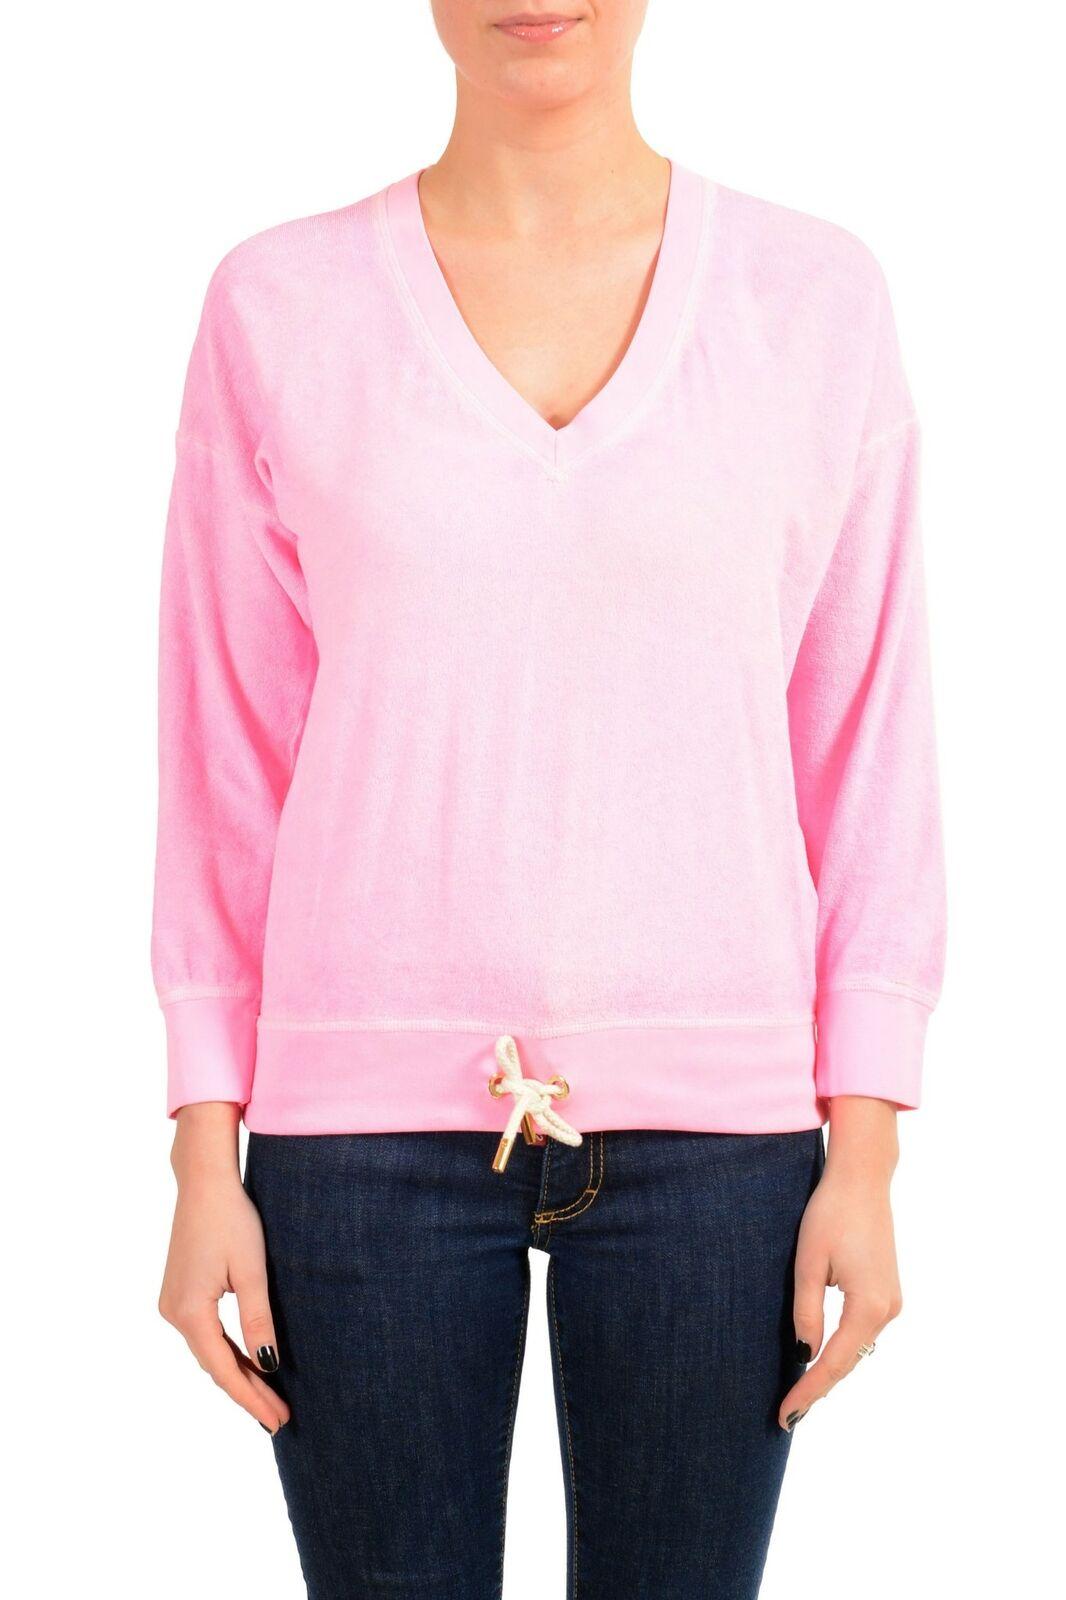 Dsquared2 Damen Pink V-Ausschnitt Sweatshirt Größe M L XL